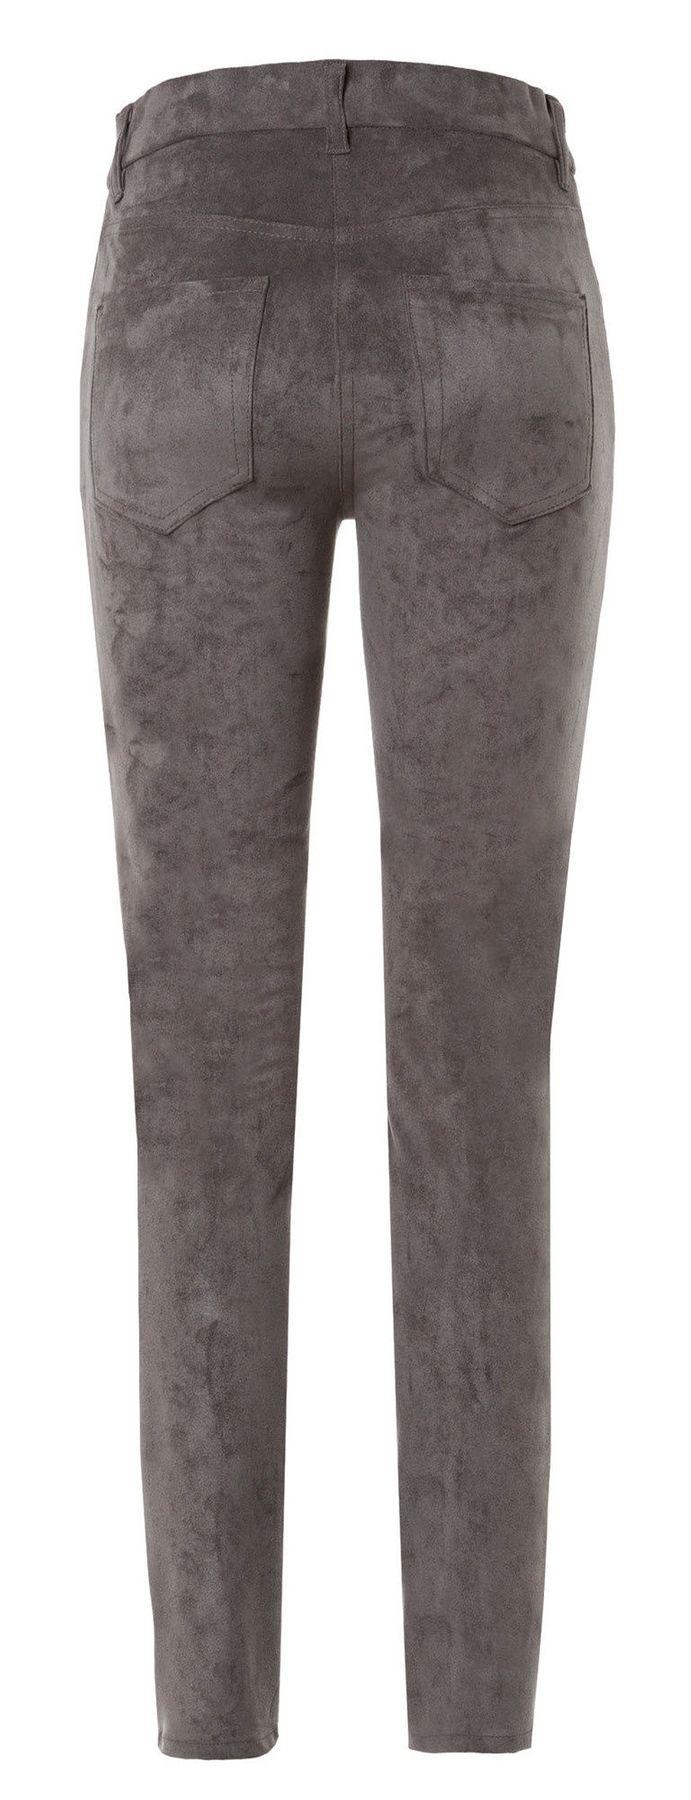 Atelier Gardeur - Modern Fit - Slip On Damenhose in Velourslederoptik Zeggi4 (600711) – Bild 9